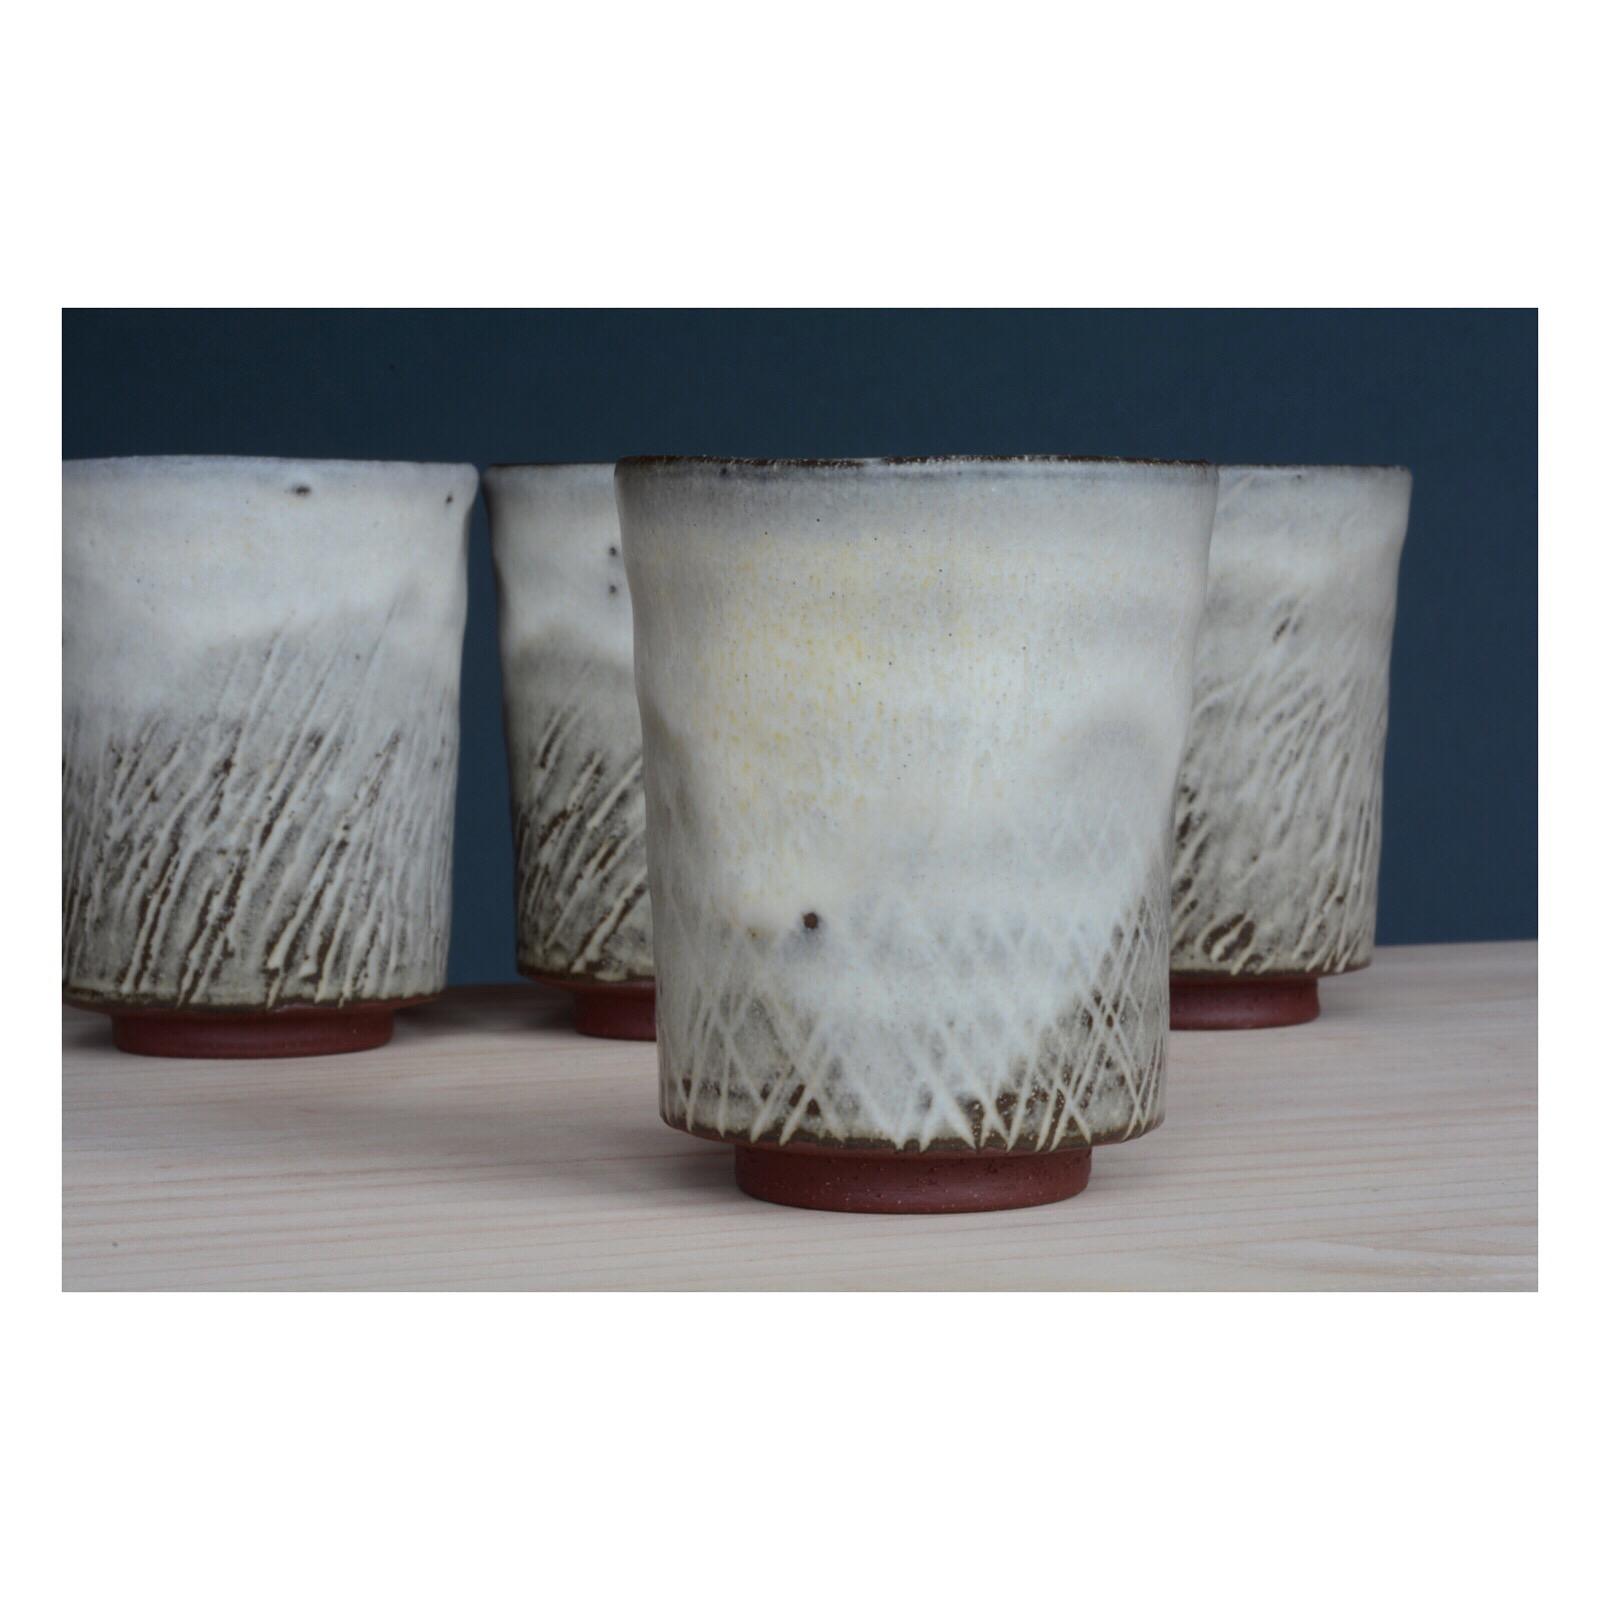 Yunomi-Tea Cups.JPG